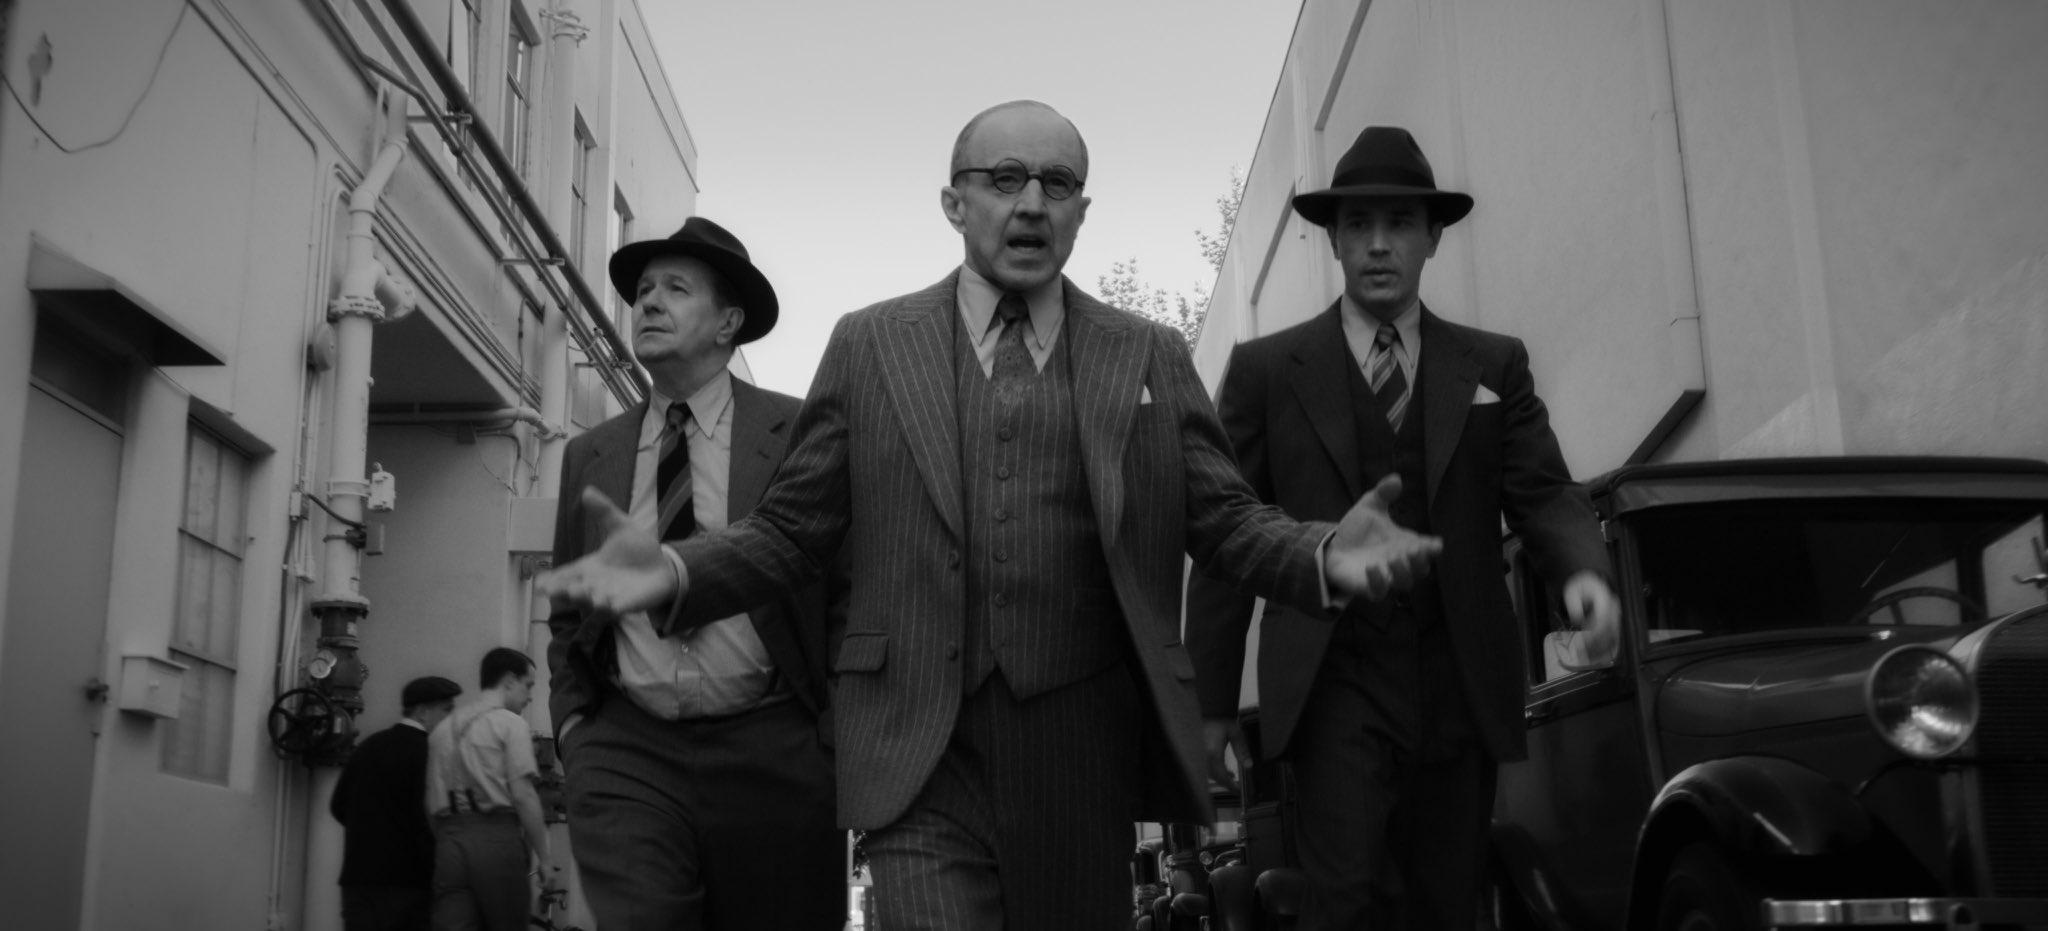 David Fincher Mank Netflix Bild 3